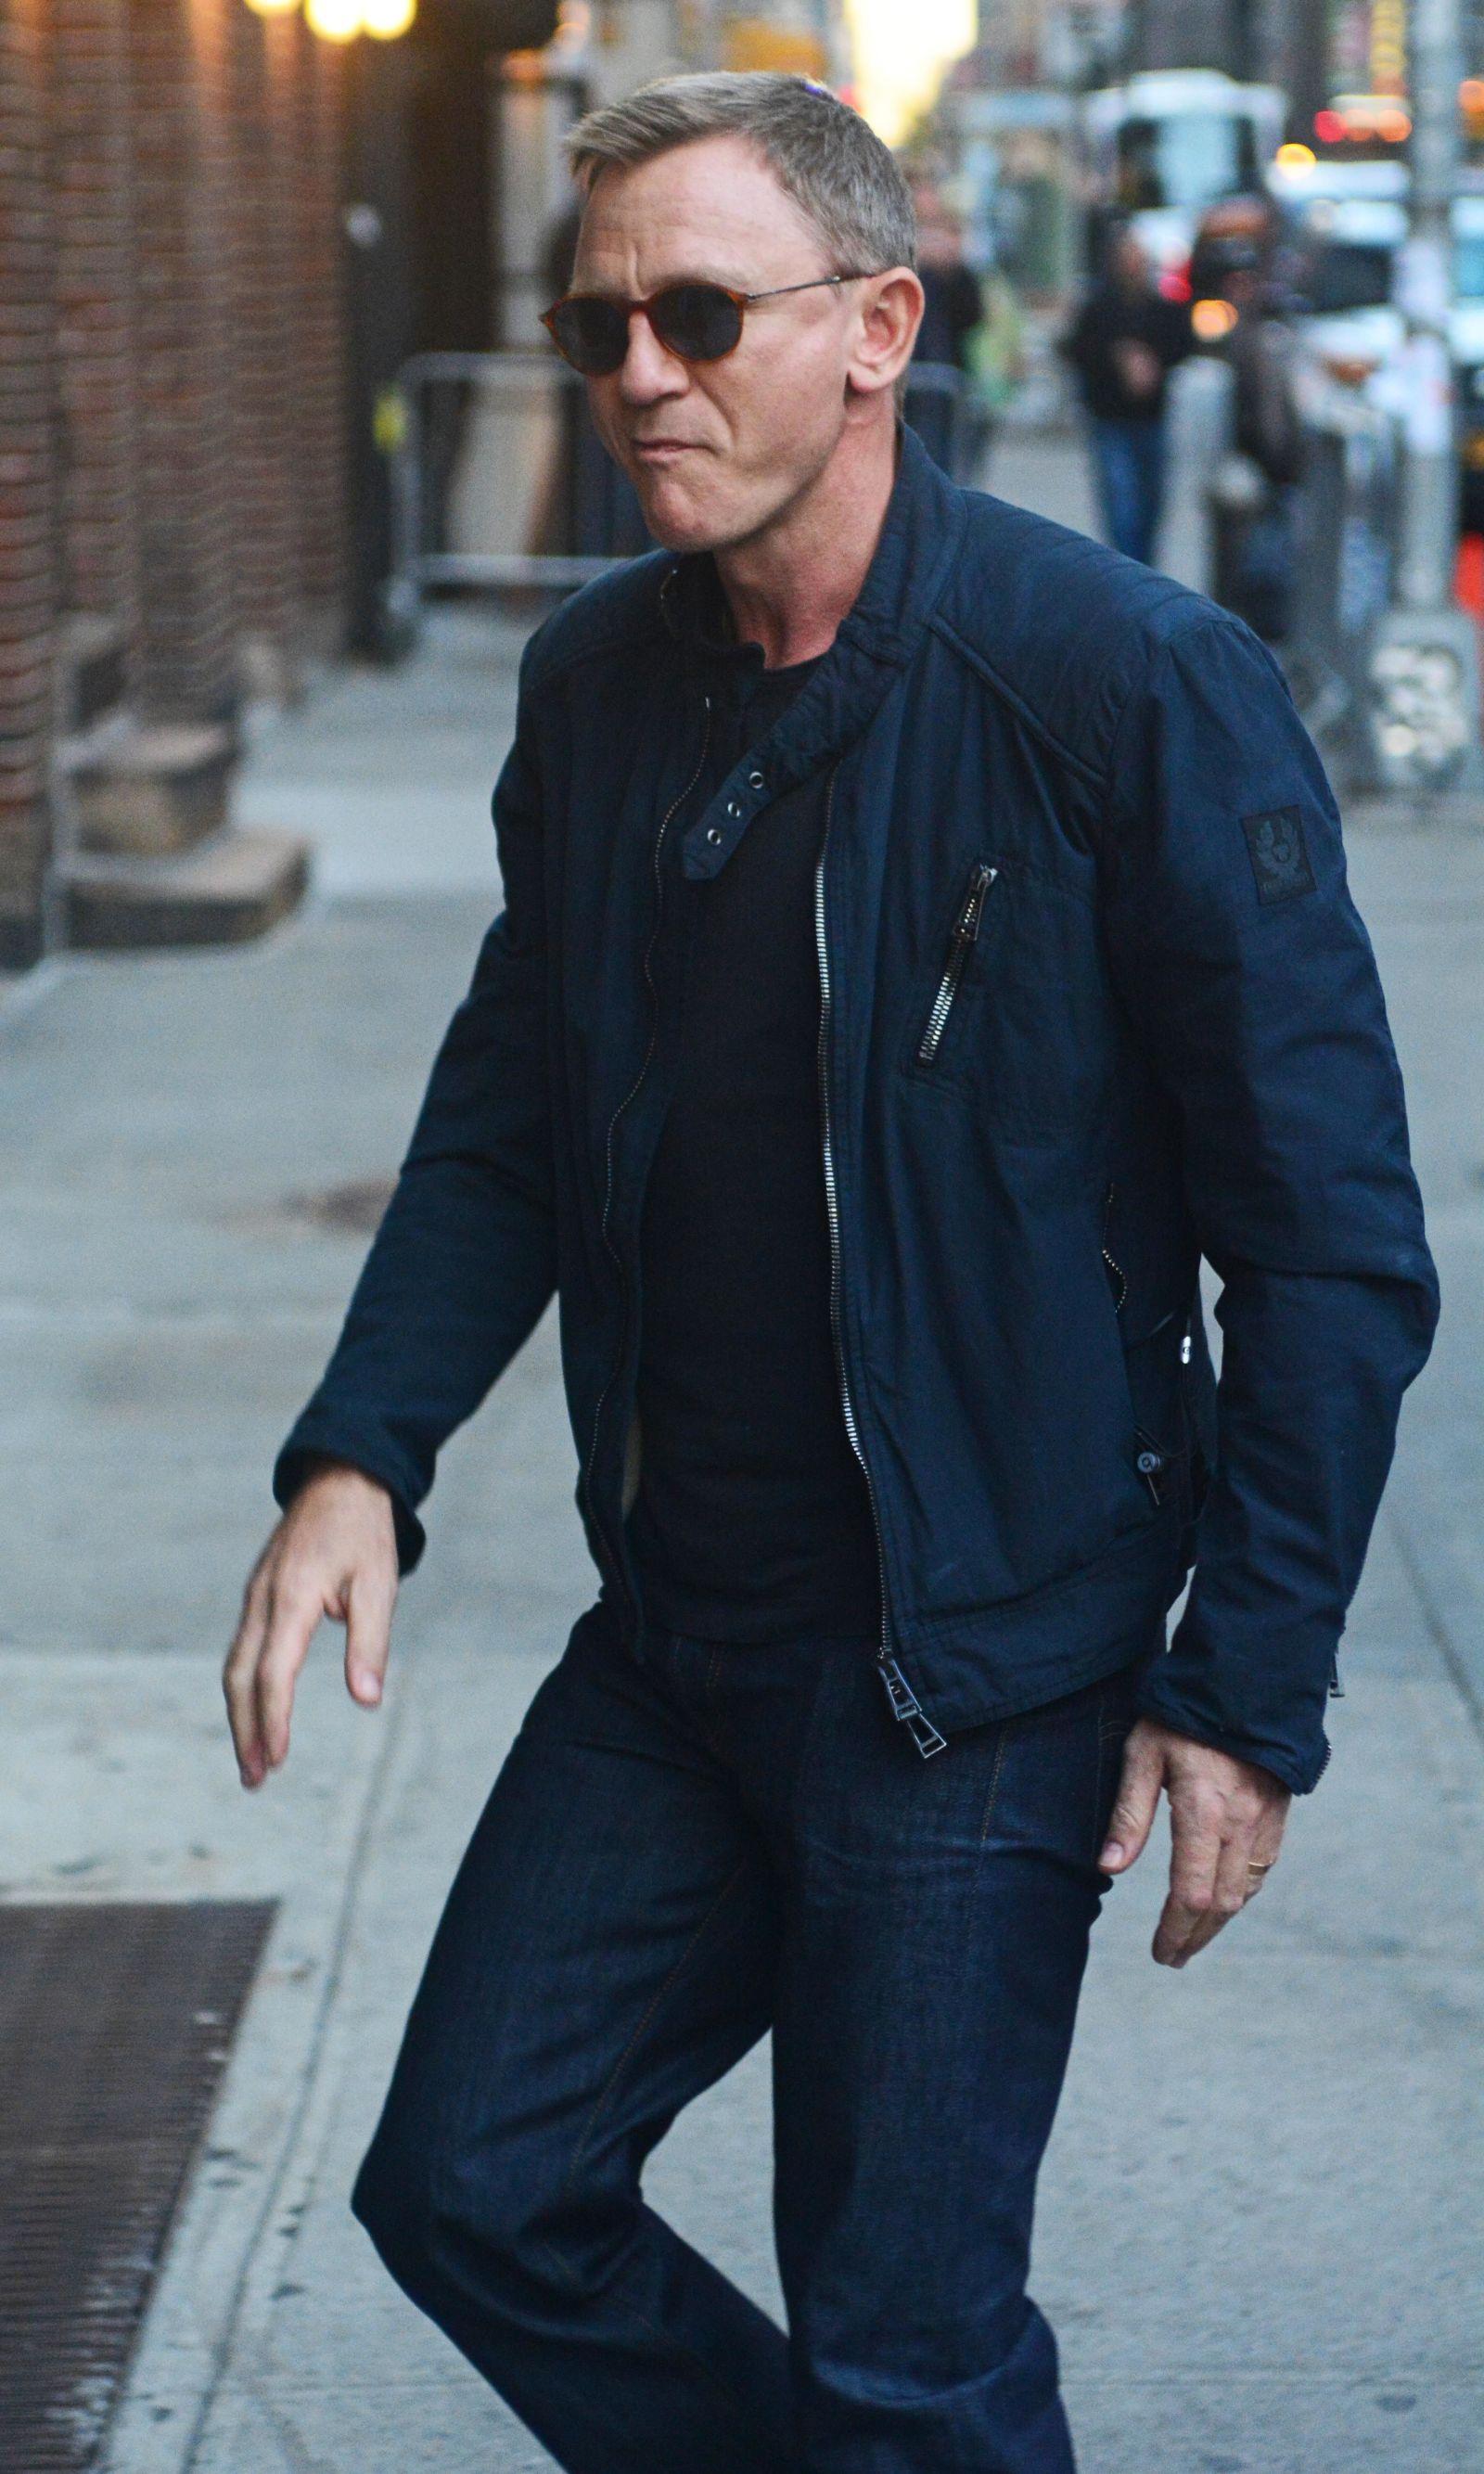 a14aedfbcea 5 Style Lessons You Can Learn From Daniel Craig Estilo De Daniel Craig